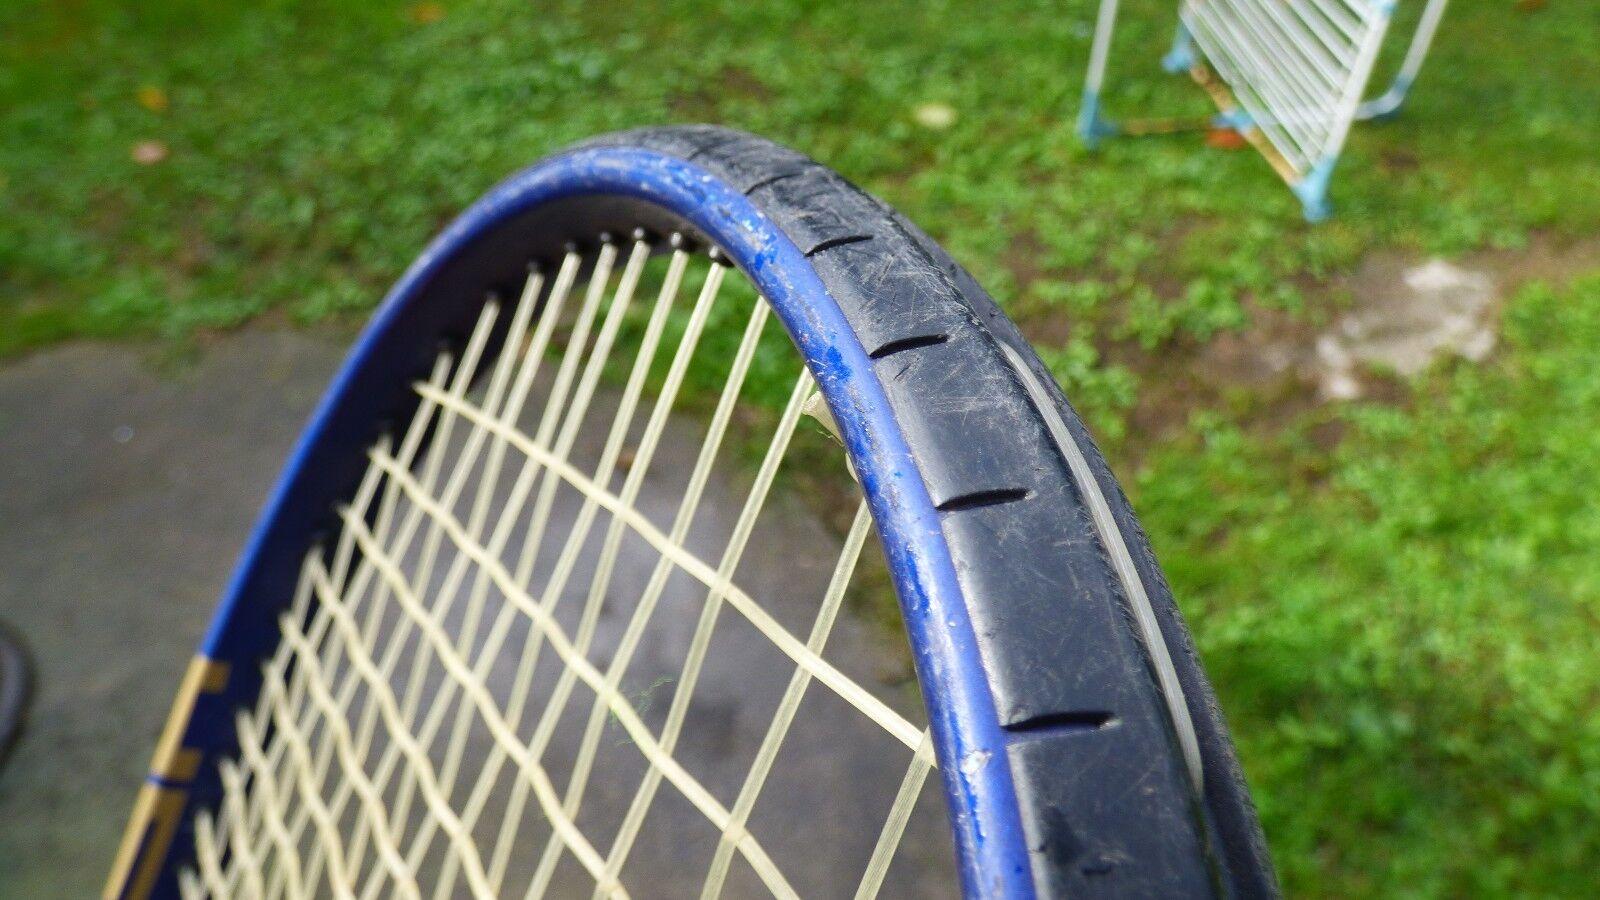 Raquette de tennis  Head Ventoris tennis L Pyramid  tennis Ventoris racquet 5ccc4d